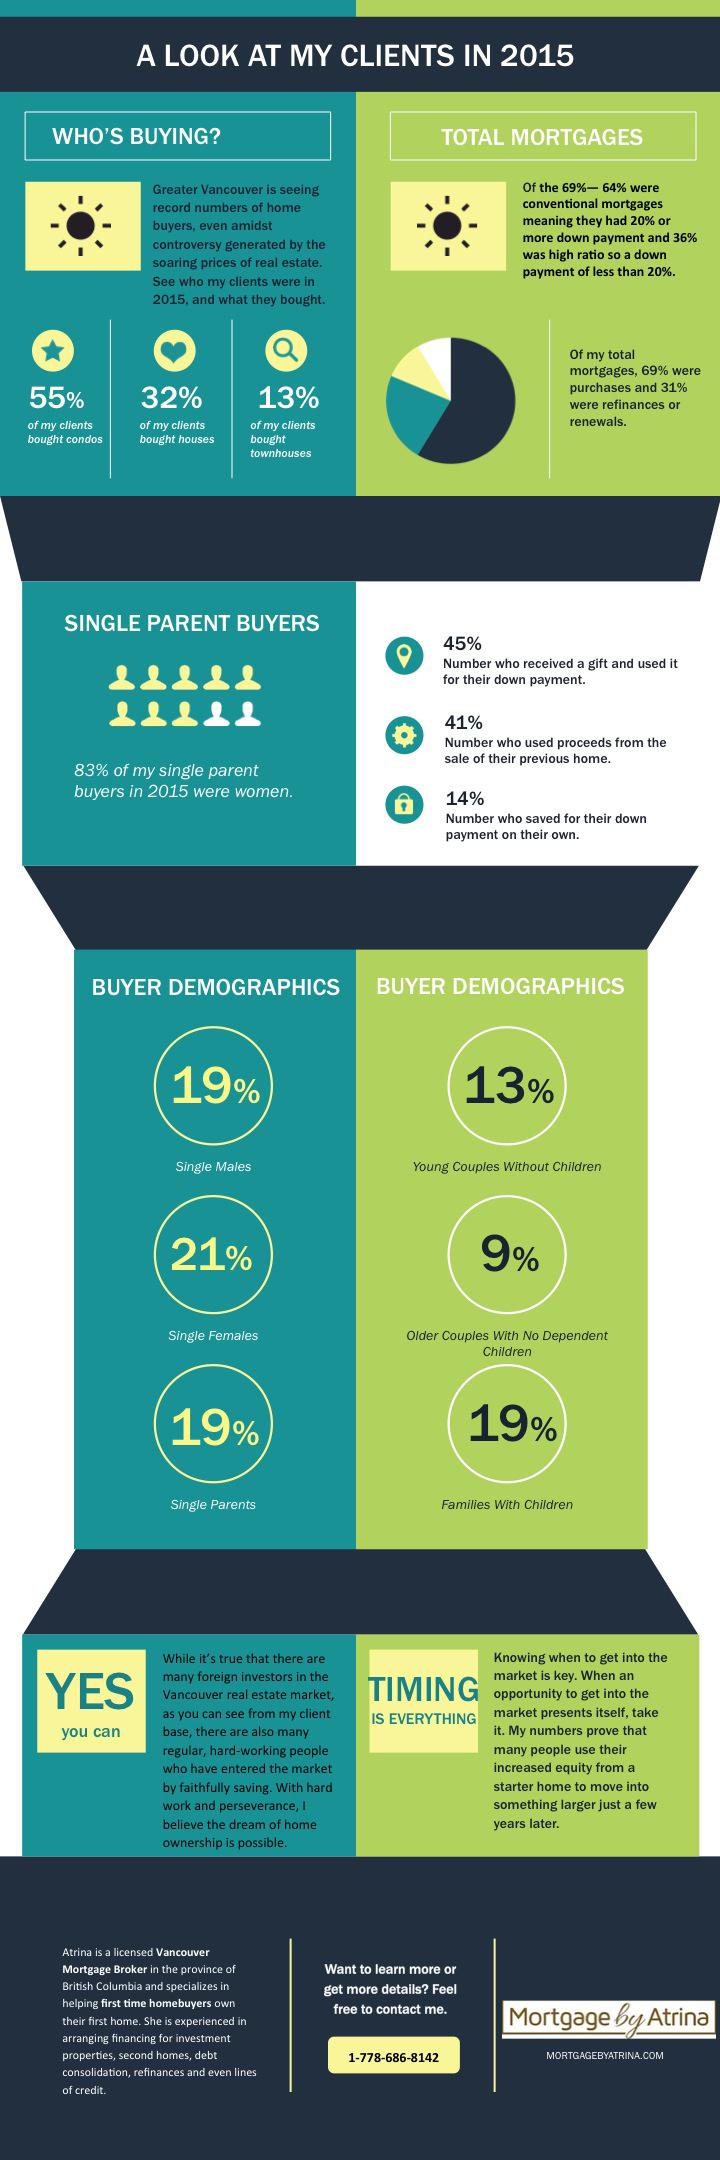 Who's Buying What- infographic by Atrina Kouroshnia